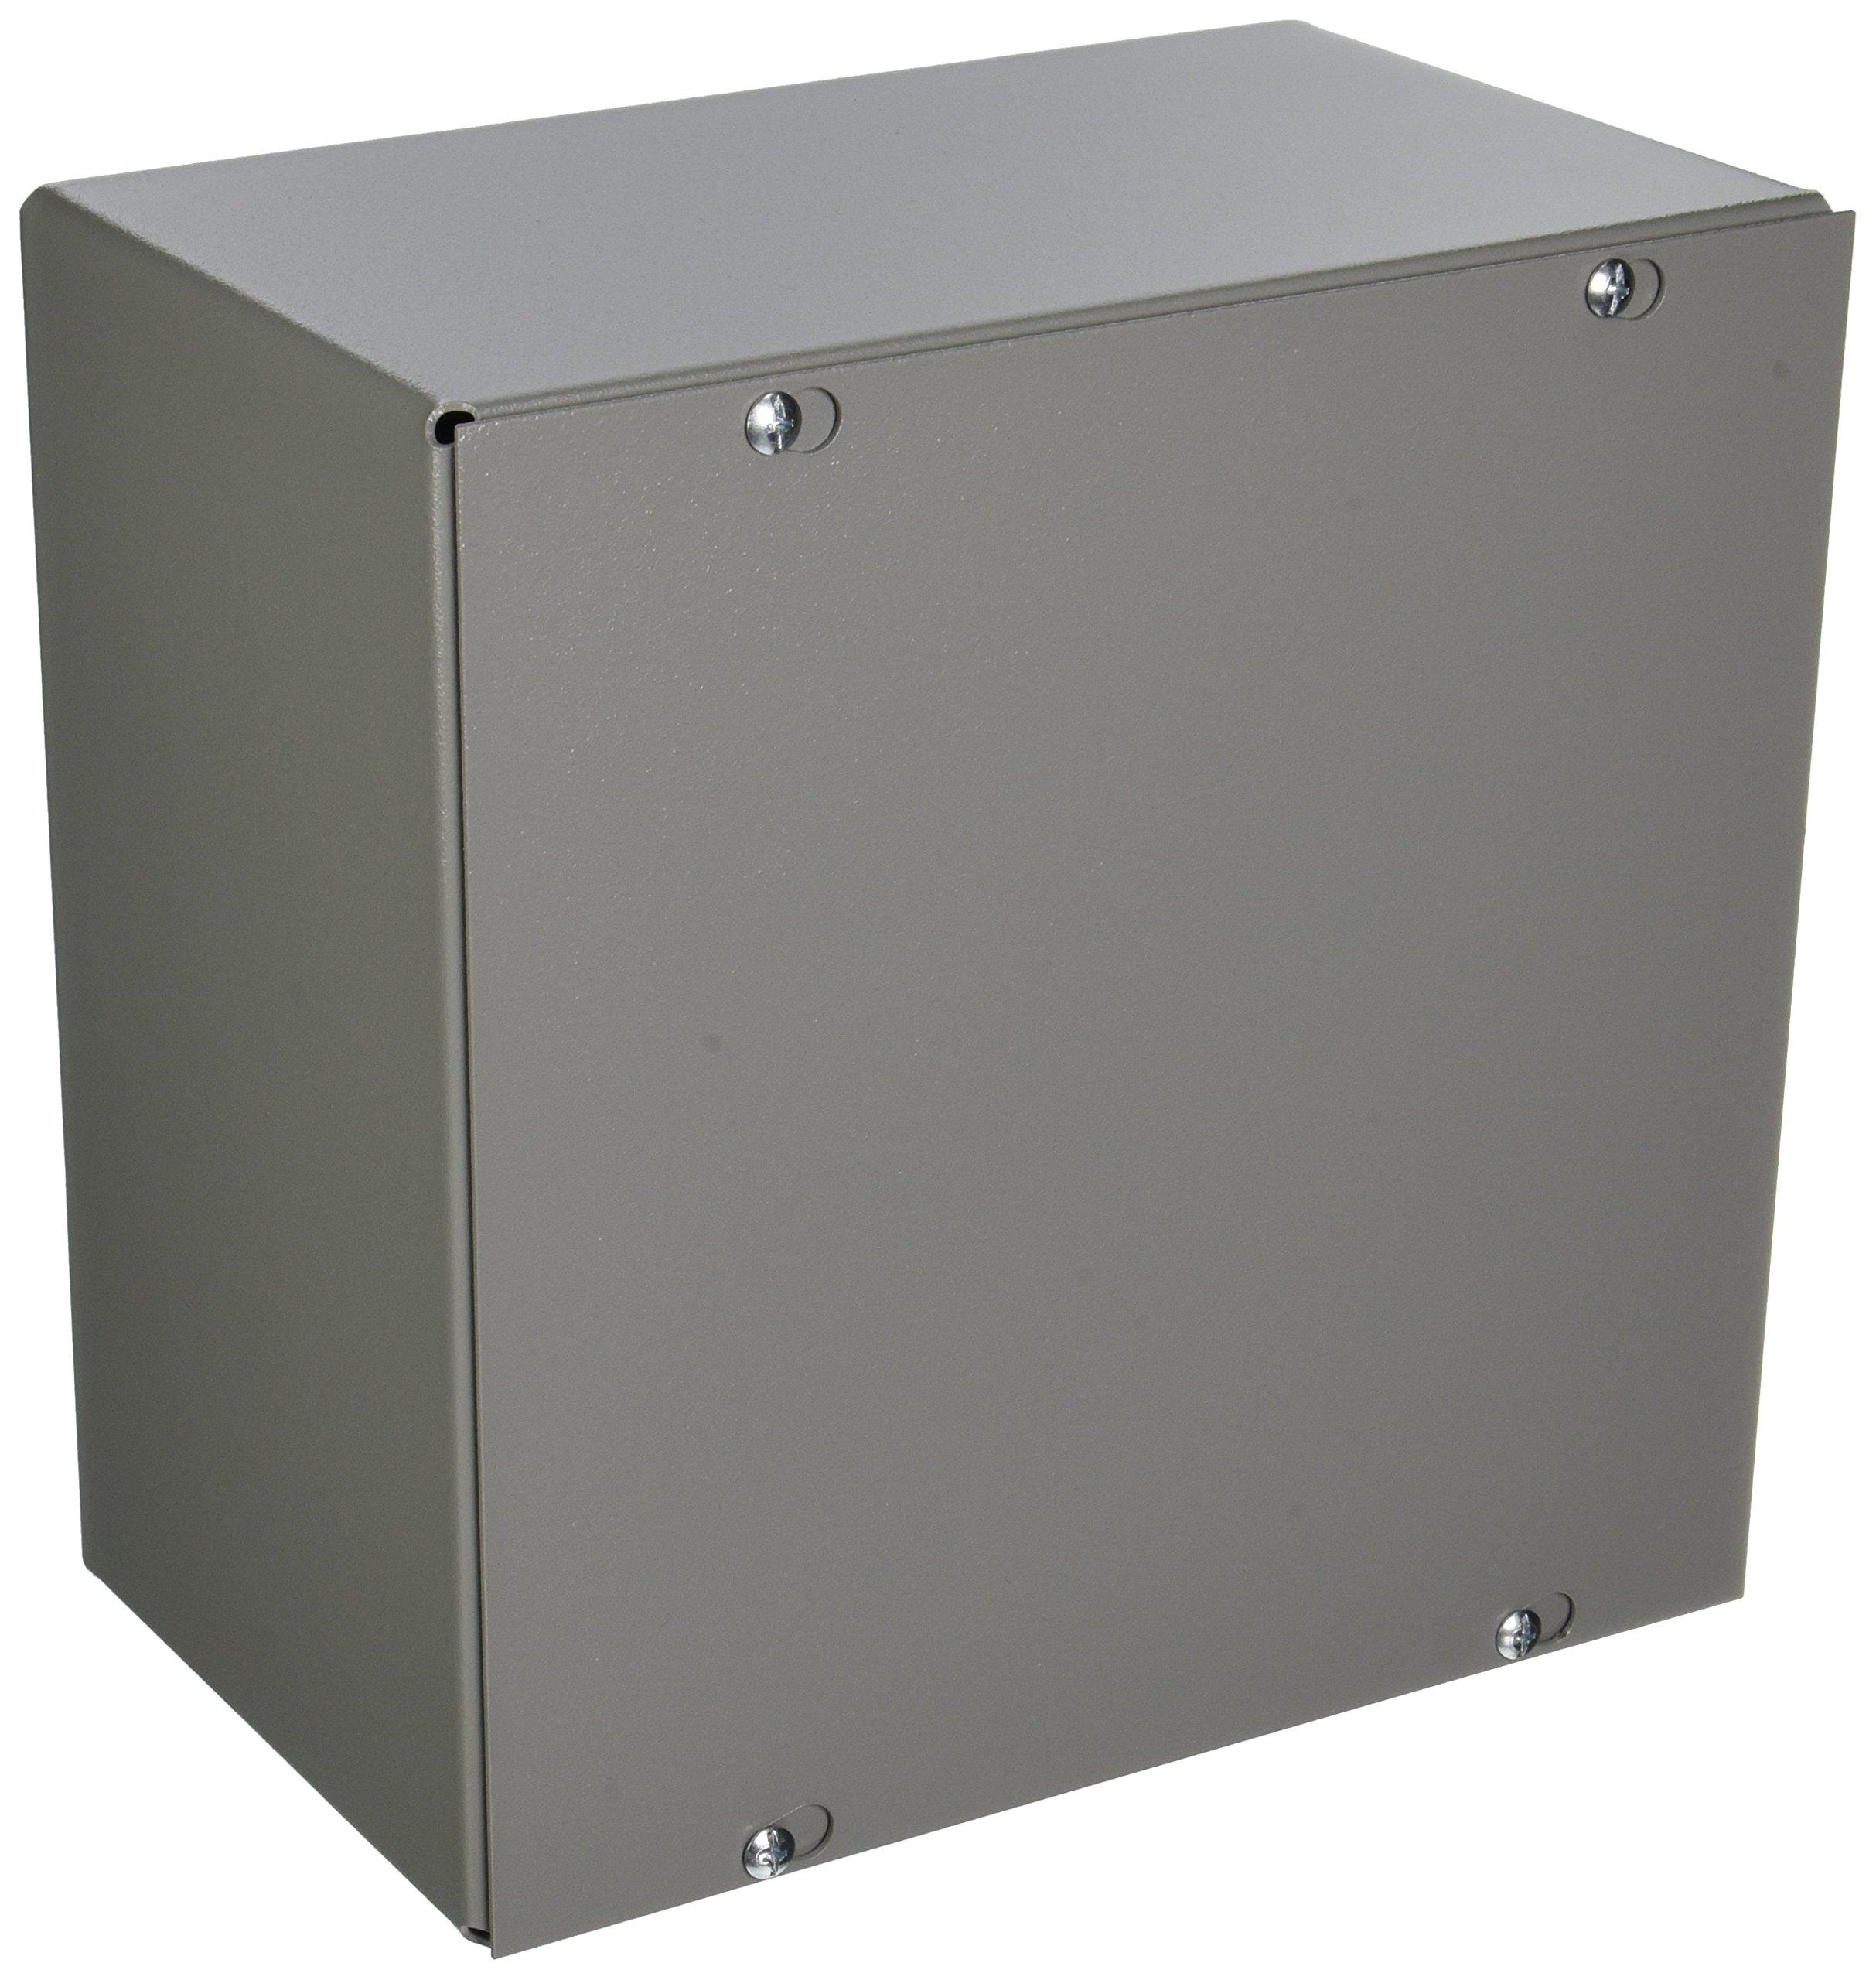 Wiegmann SC101006NK SC-Series NEMA 1 Screw Cover Wallmount Pull Box, No Knockouts, Painted Steel, 10'' x 10'' x 6''